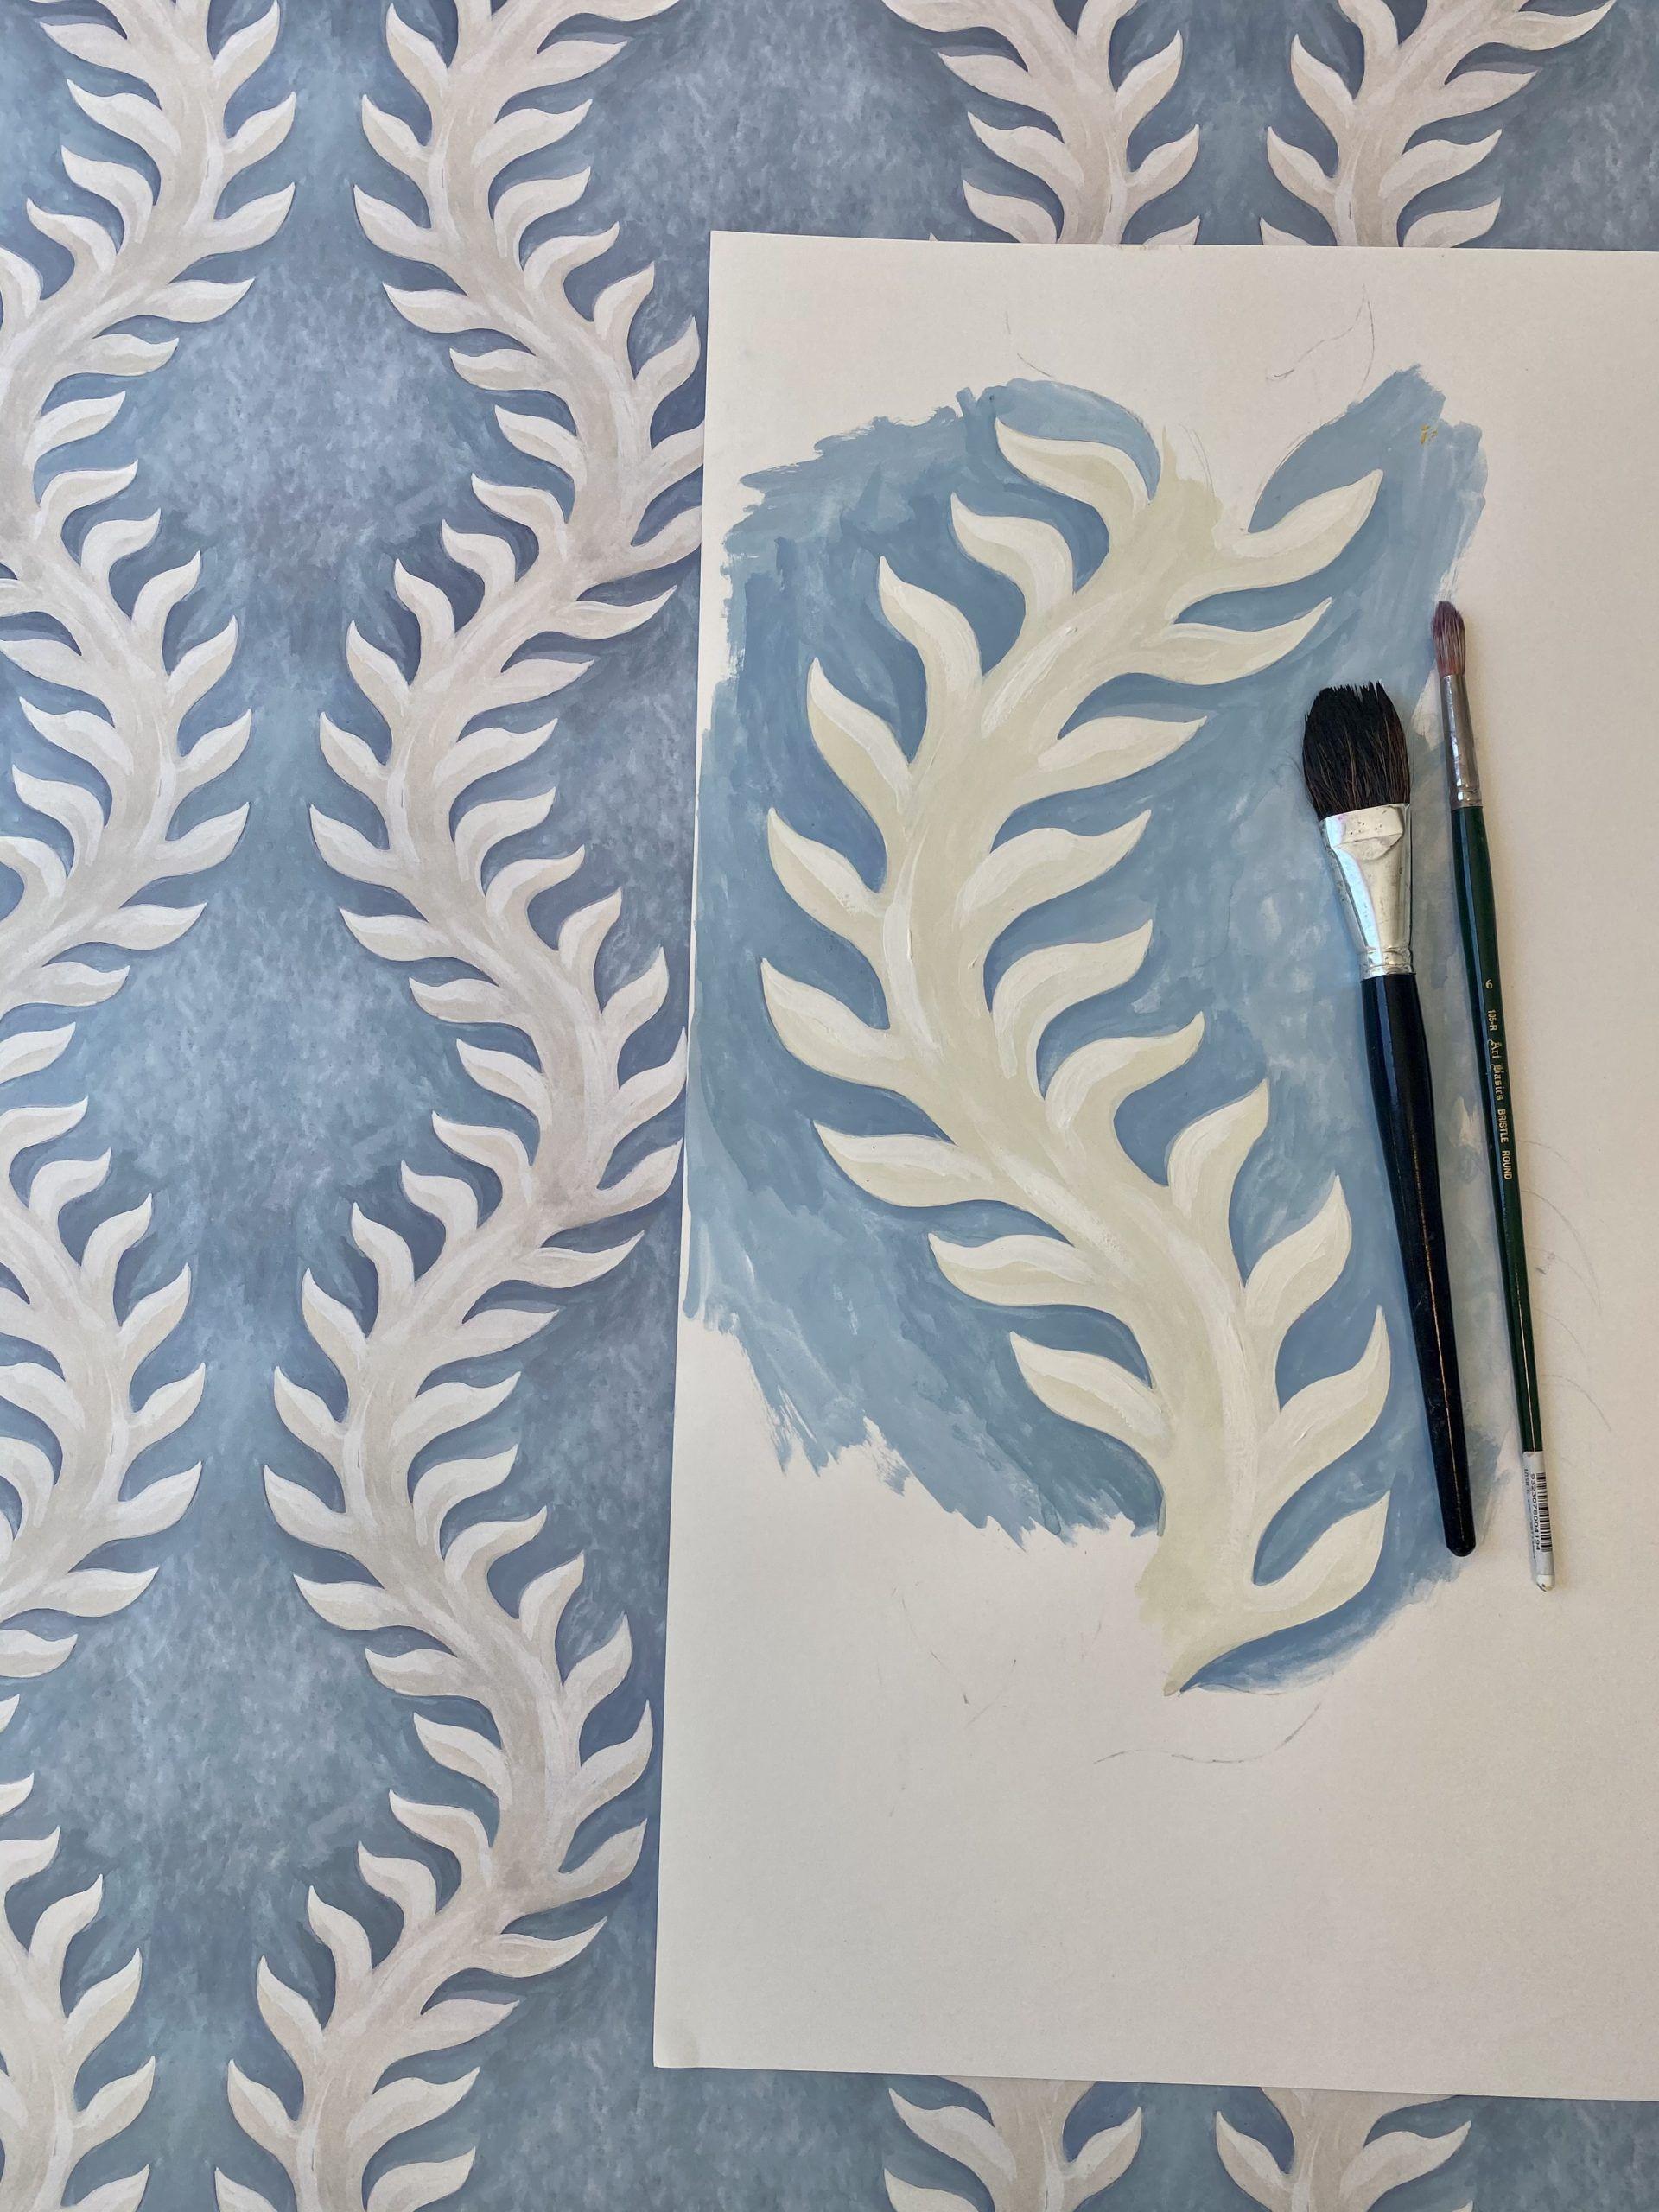 Fern Wallpaper Sketch by Bethany Linz